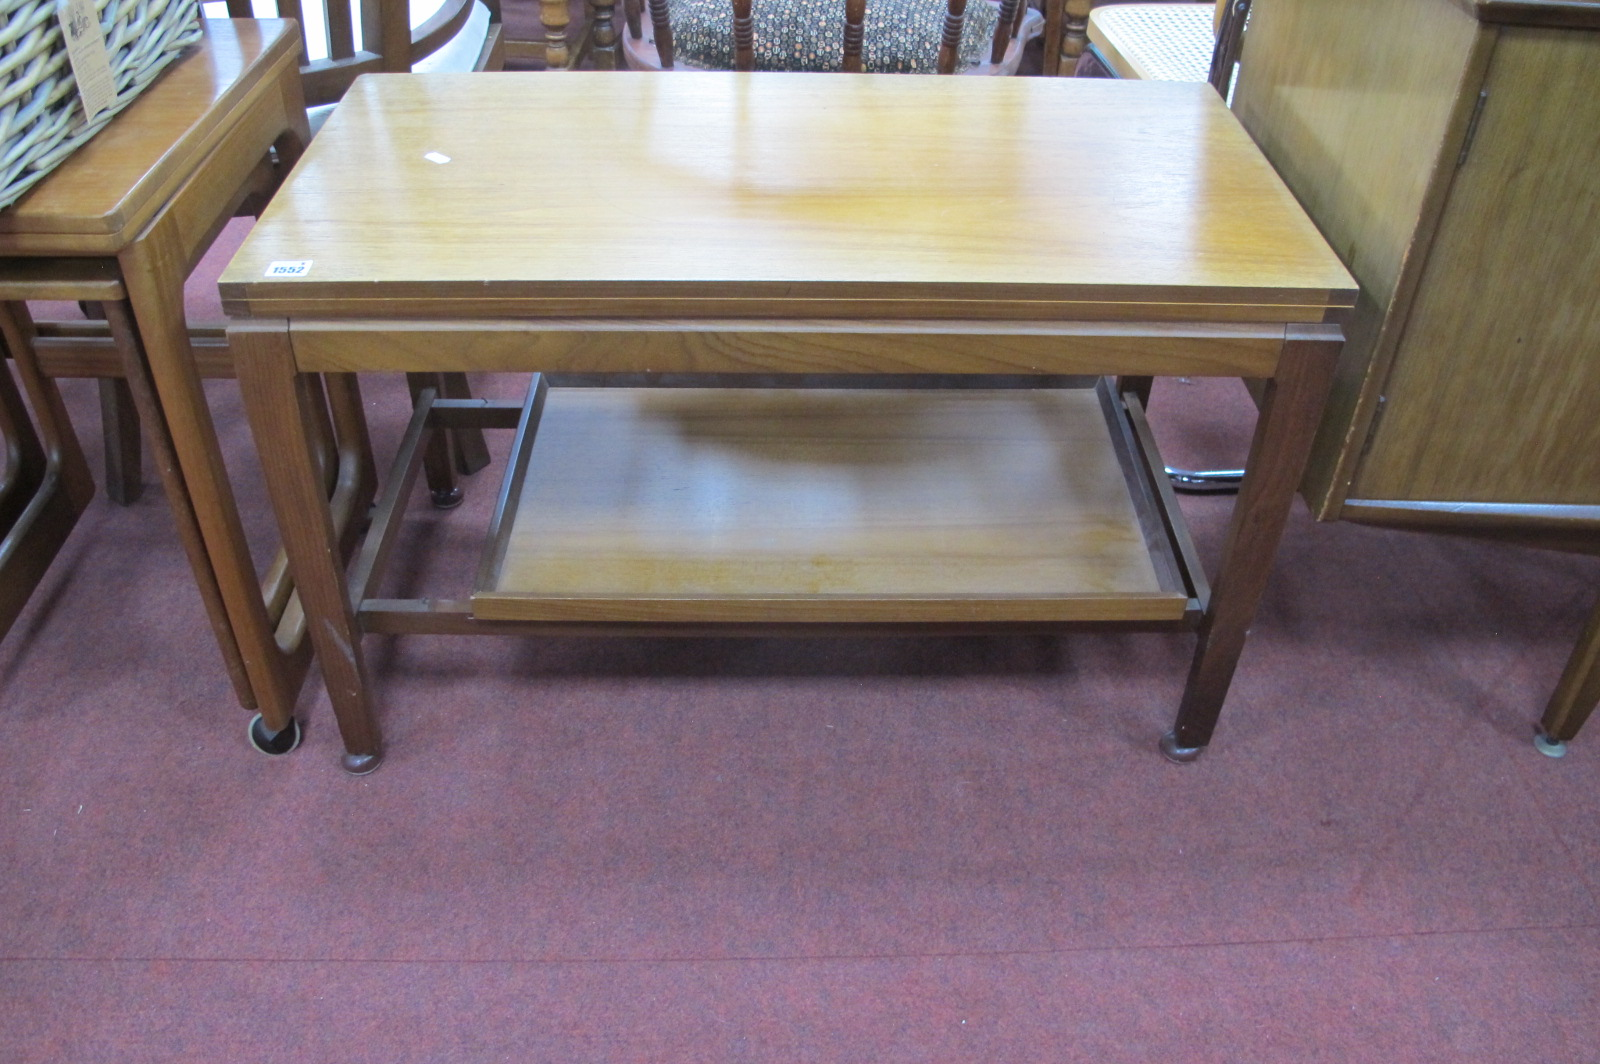 Remply Teak Fold-Over Tea Table, on straight legs with undershelf.